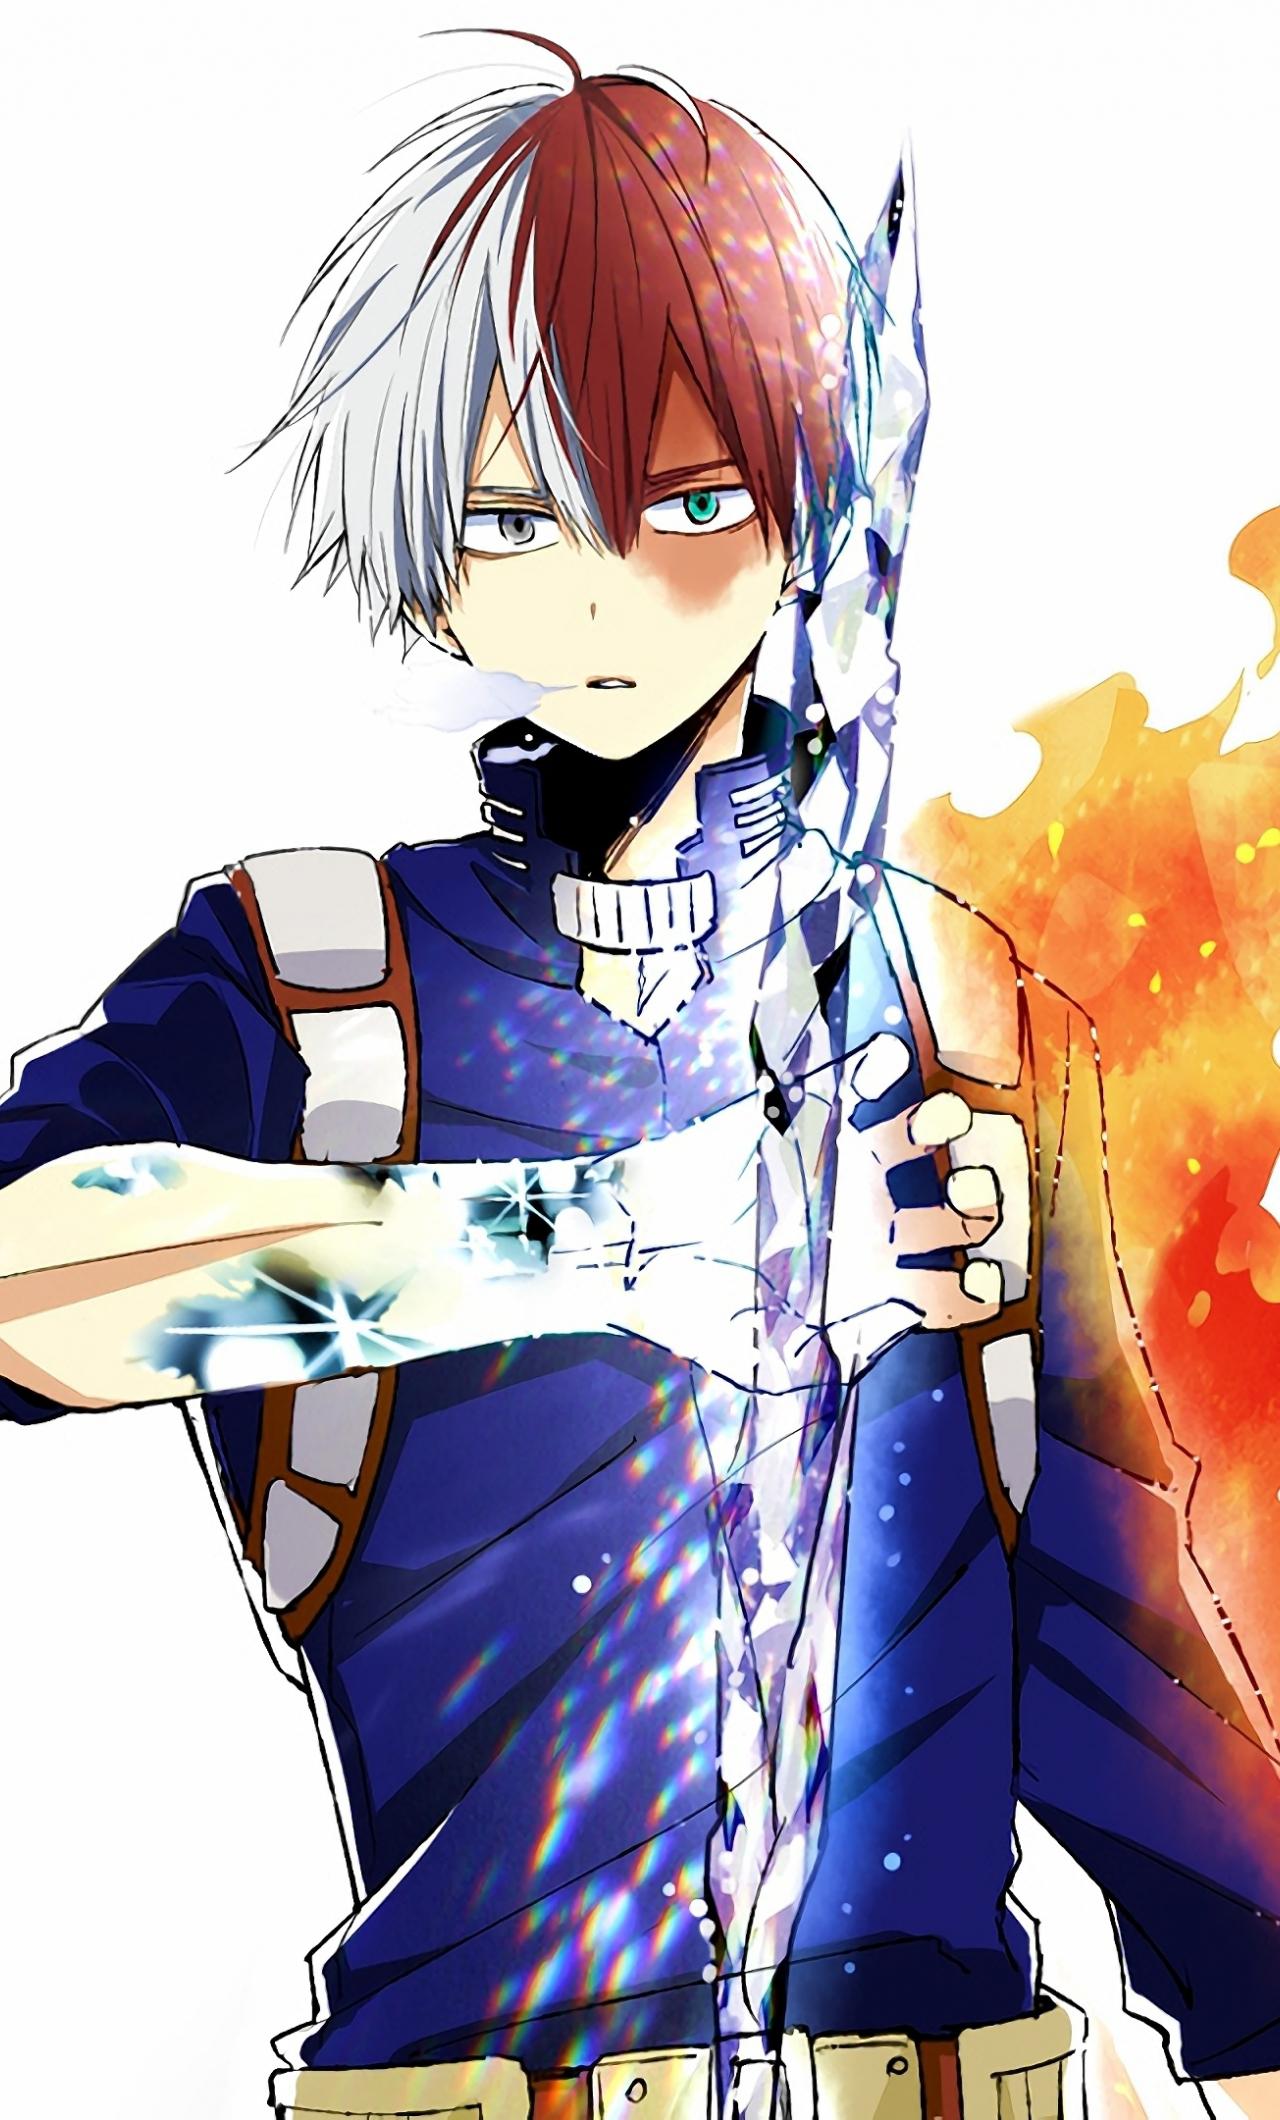 Download 1280x2120 Wallpaper Anime Shouto Todoroki Ice And